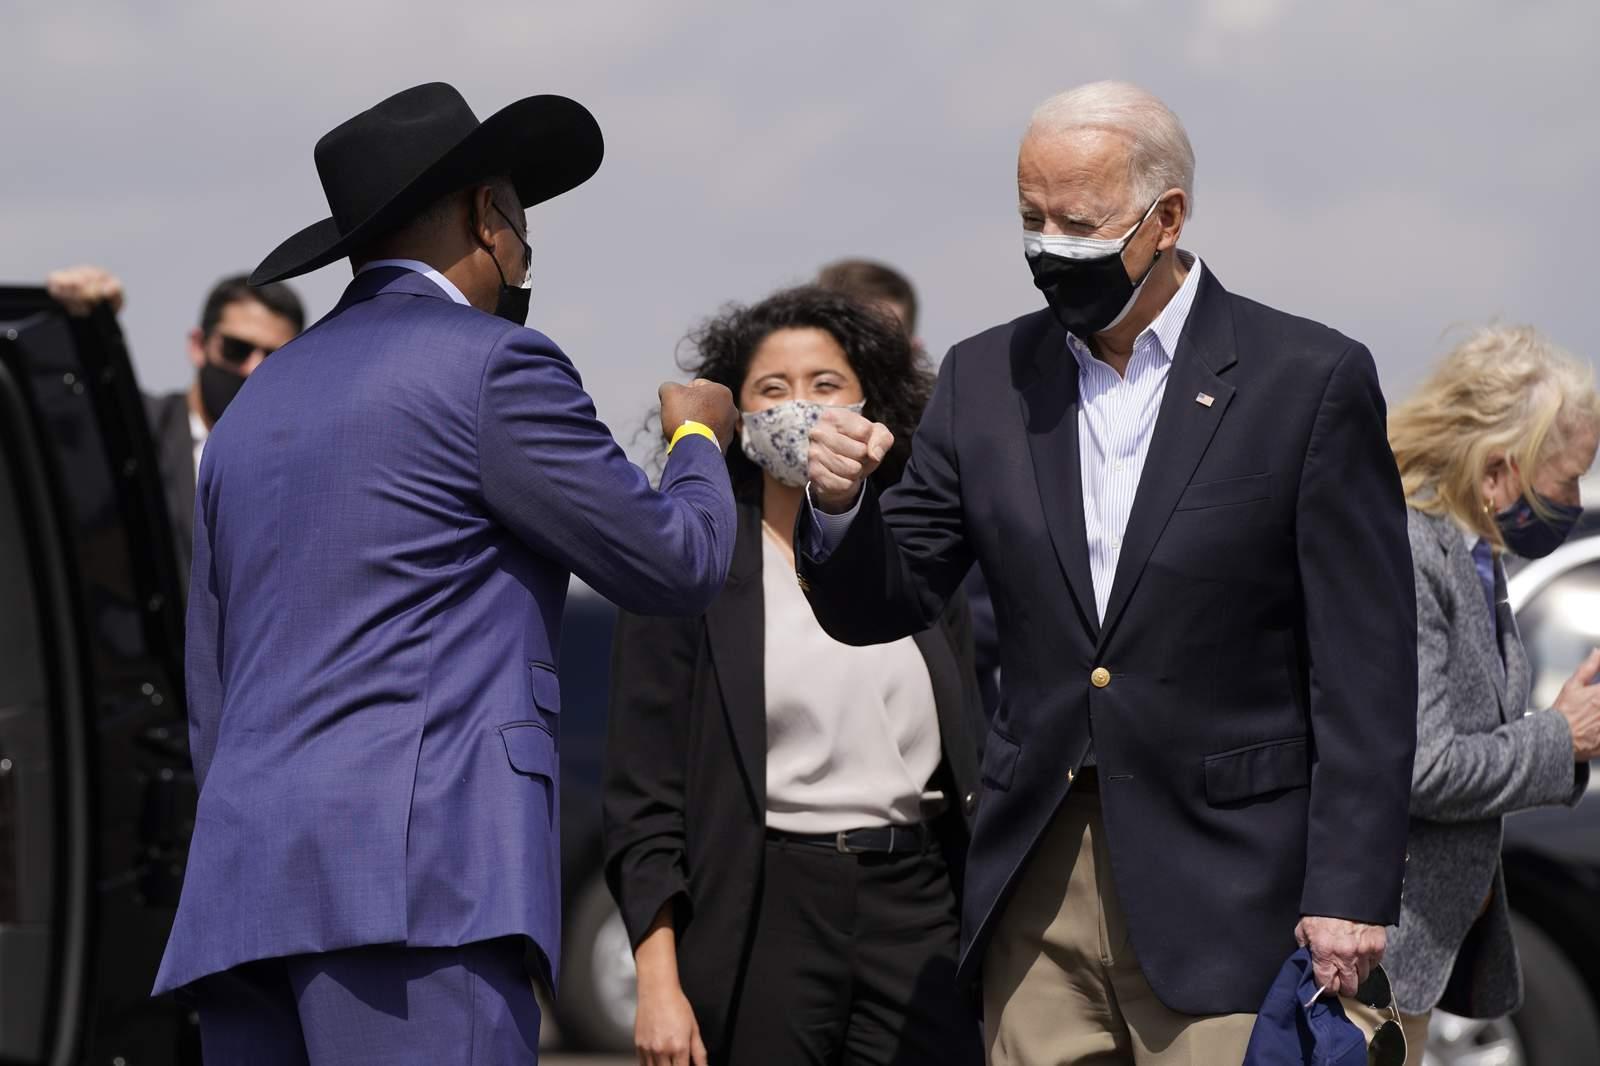 President Joe Biden greets Houston Mayor Sylvester Turner after stepping off Air Force One at Ellington Field Joint Reserve Base in Houston, Friday, Feb. 26, 2021. (AP Photo/Patrick Semansky)